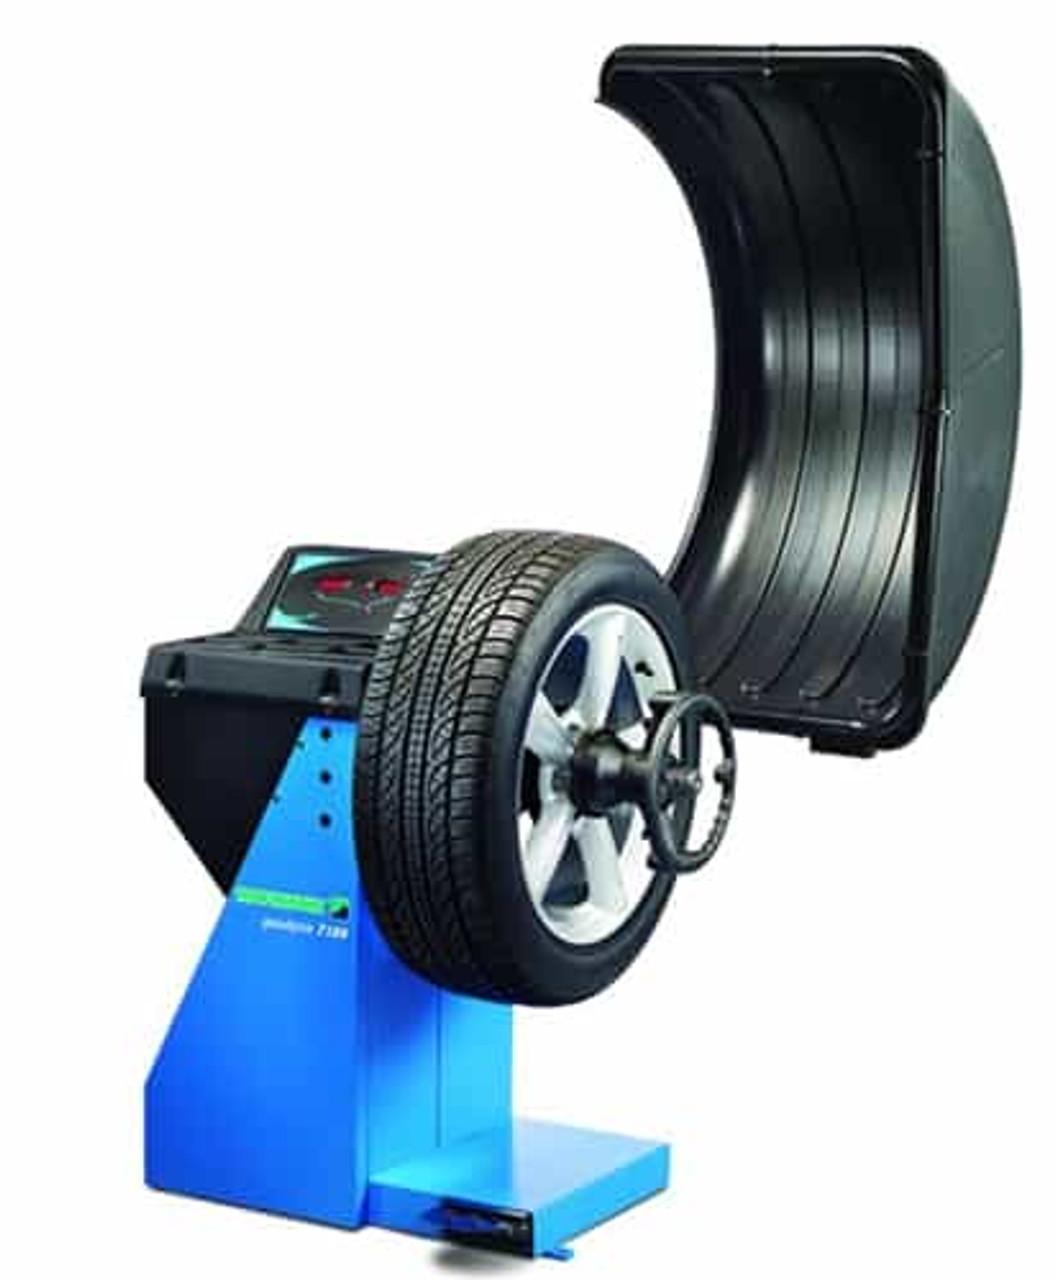 Hofmann geodyna™ 7100M Motorcycle Wheel Balancer